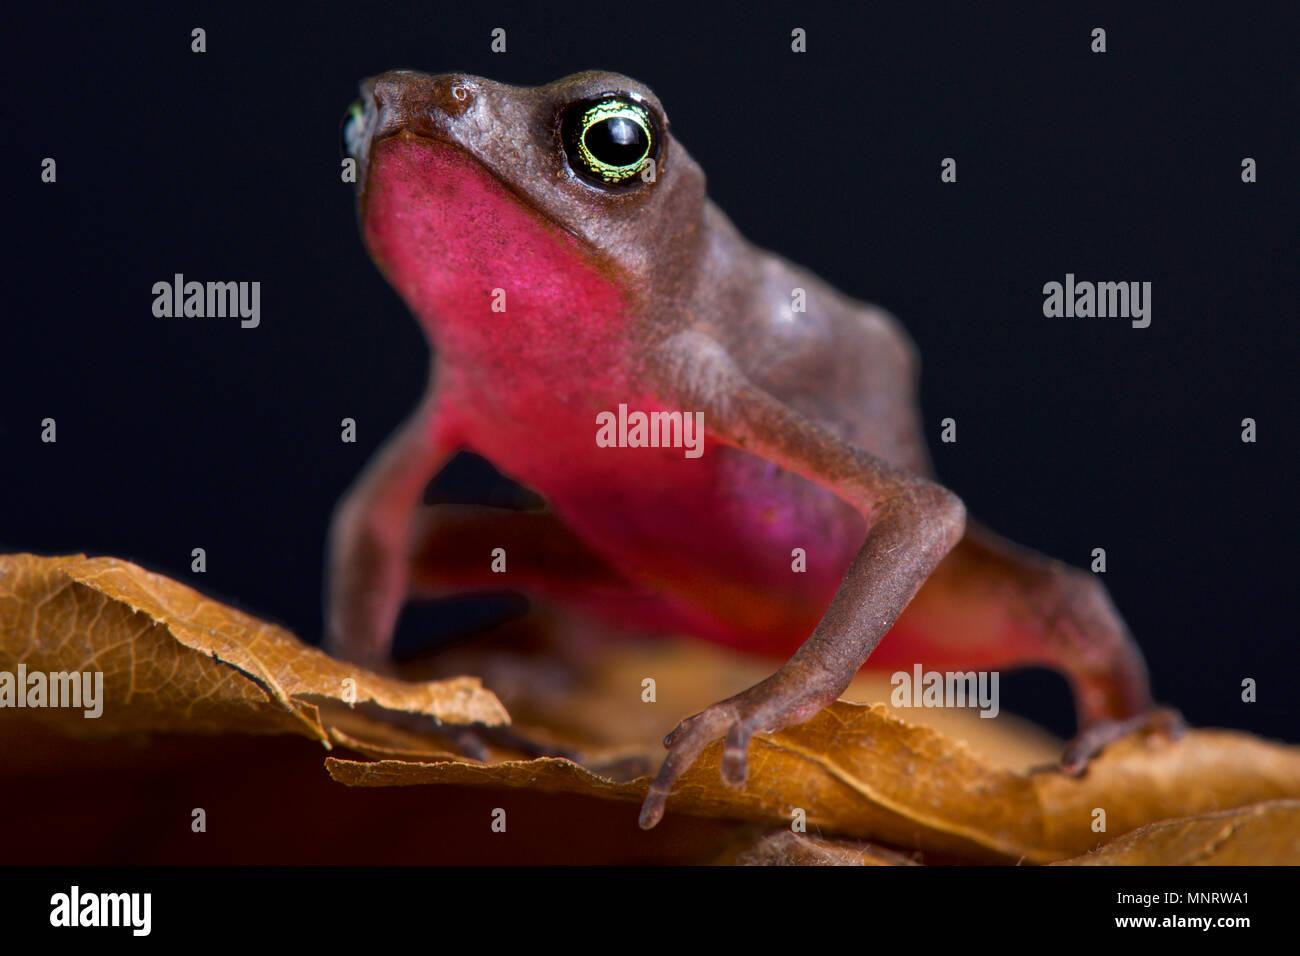 Central coast stubfoot toad (Atelophus franciscus) - Stock Image